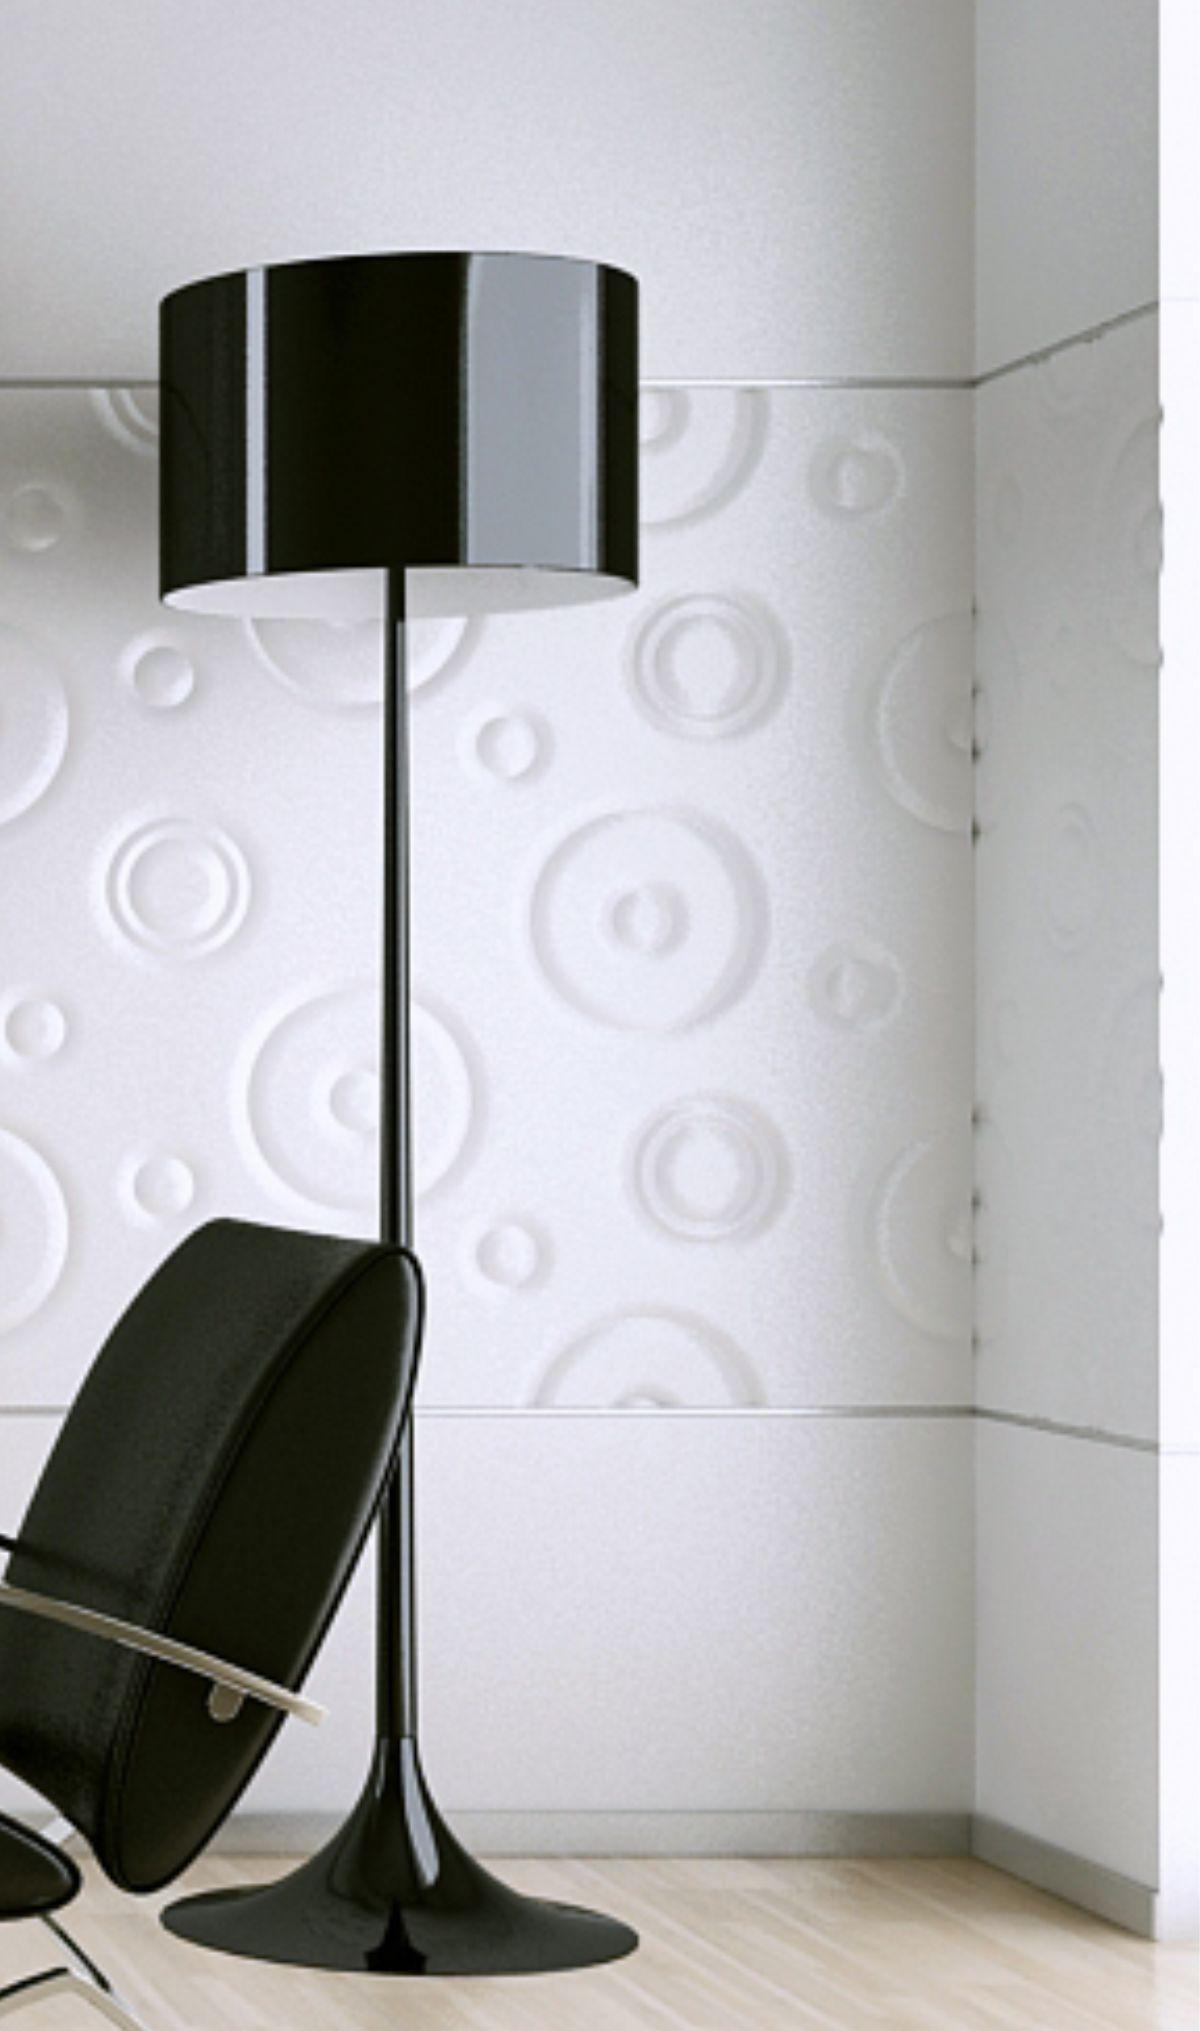 perete spatiu birou modern amenajat placat cu panouri volumetrice vopsite alb